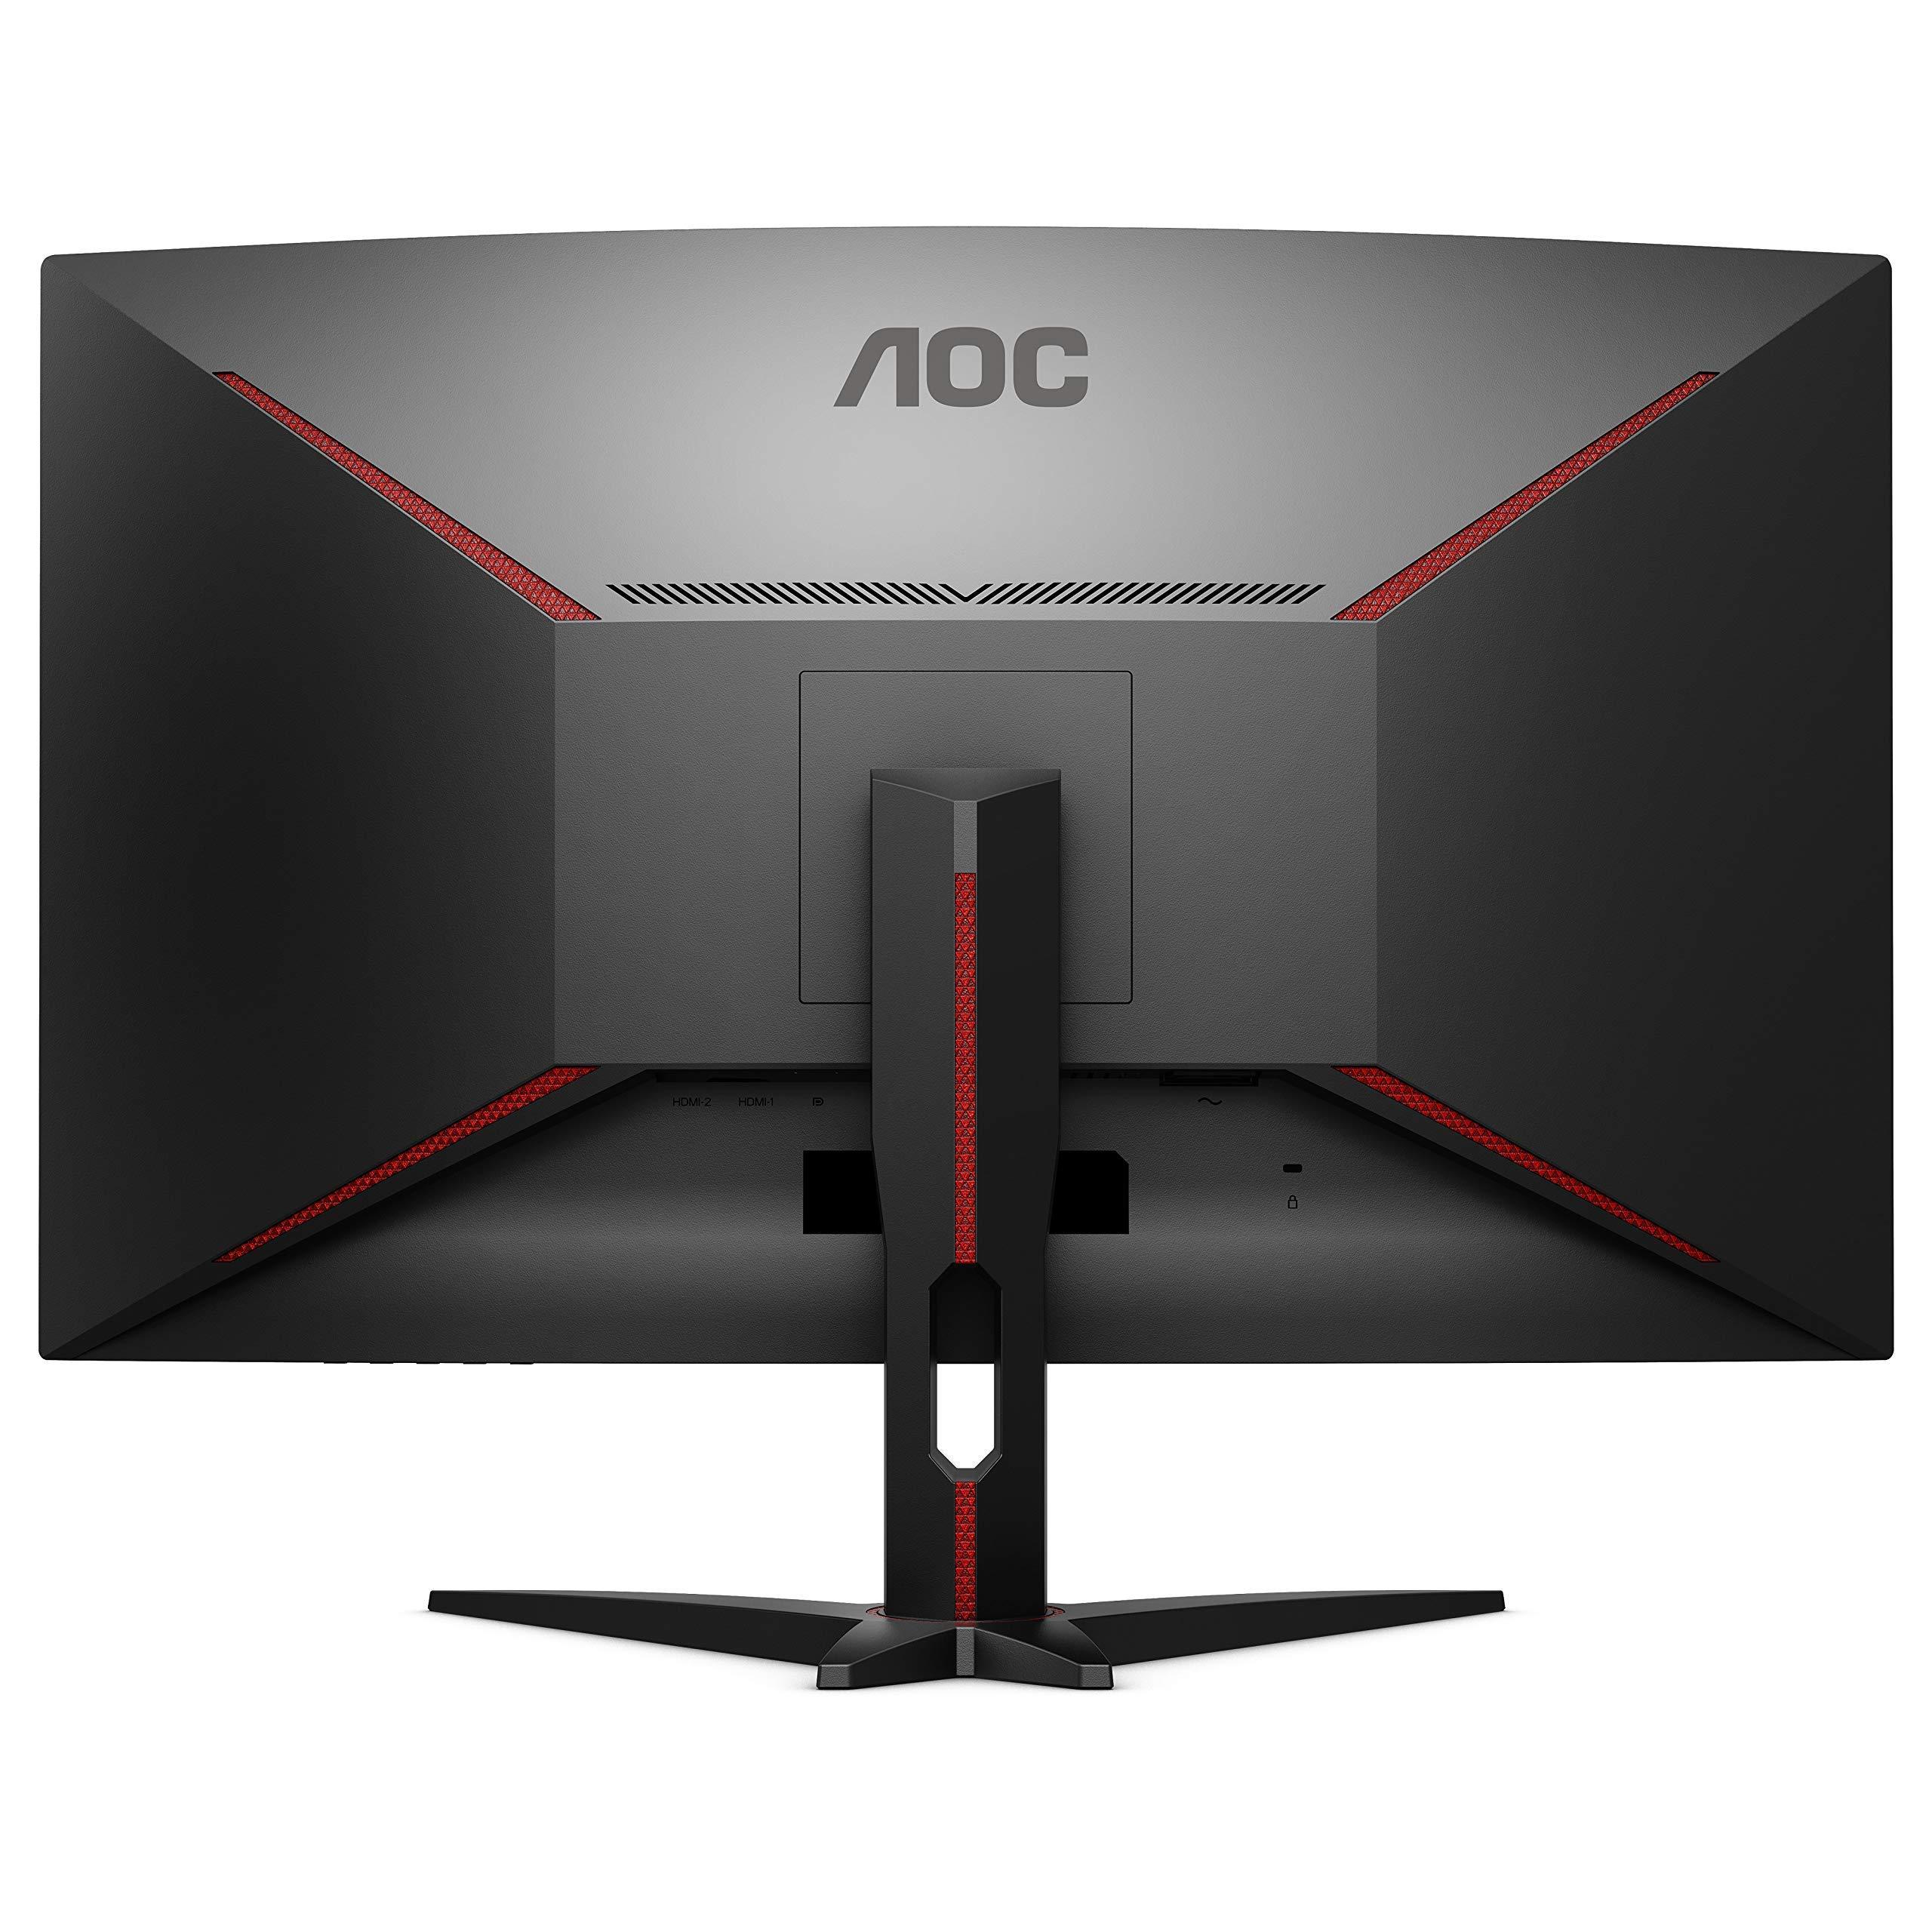 AOC CQ32G1 - 32 Inch QHD Curved Gaming Monitor, 144Hz, 1ms, VA, AMD FreeSync Premium, FlickerFree (2560x1440 @144Hz, 300cd/m², HDMI 1.4 x 1, HDMI 2.0 x 1, DisplayPort 1.2 x 1)